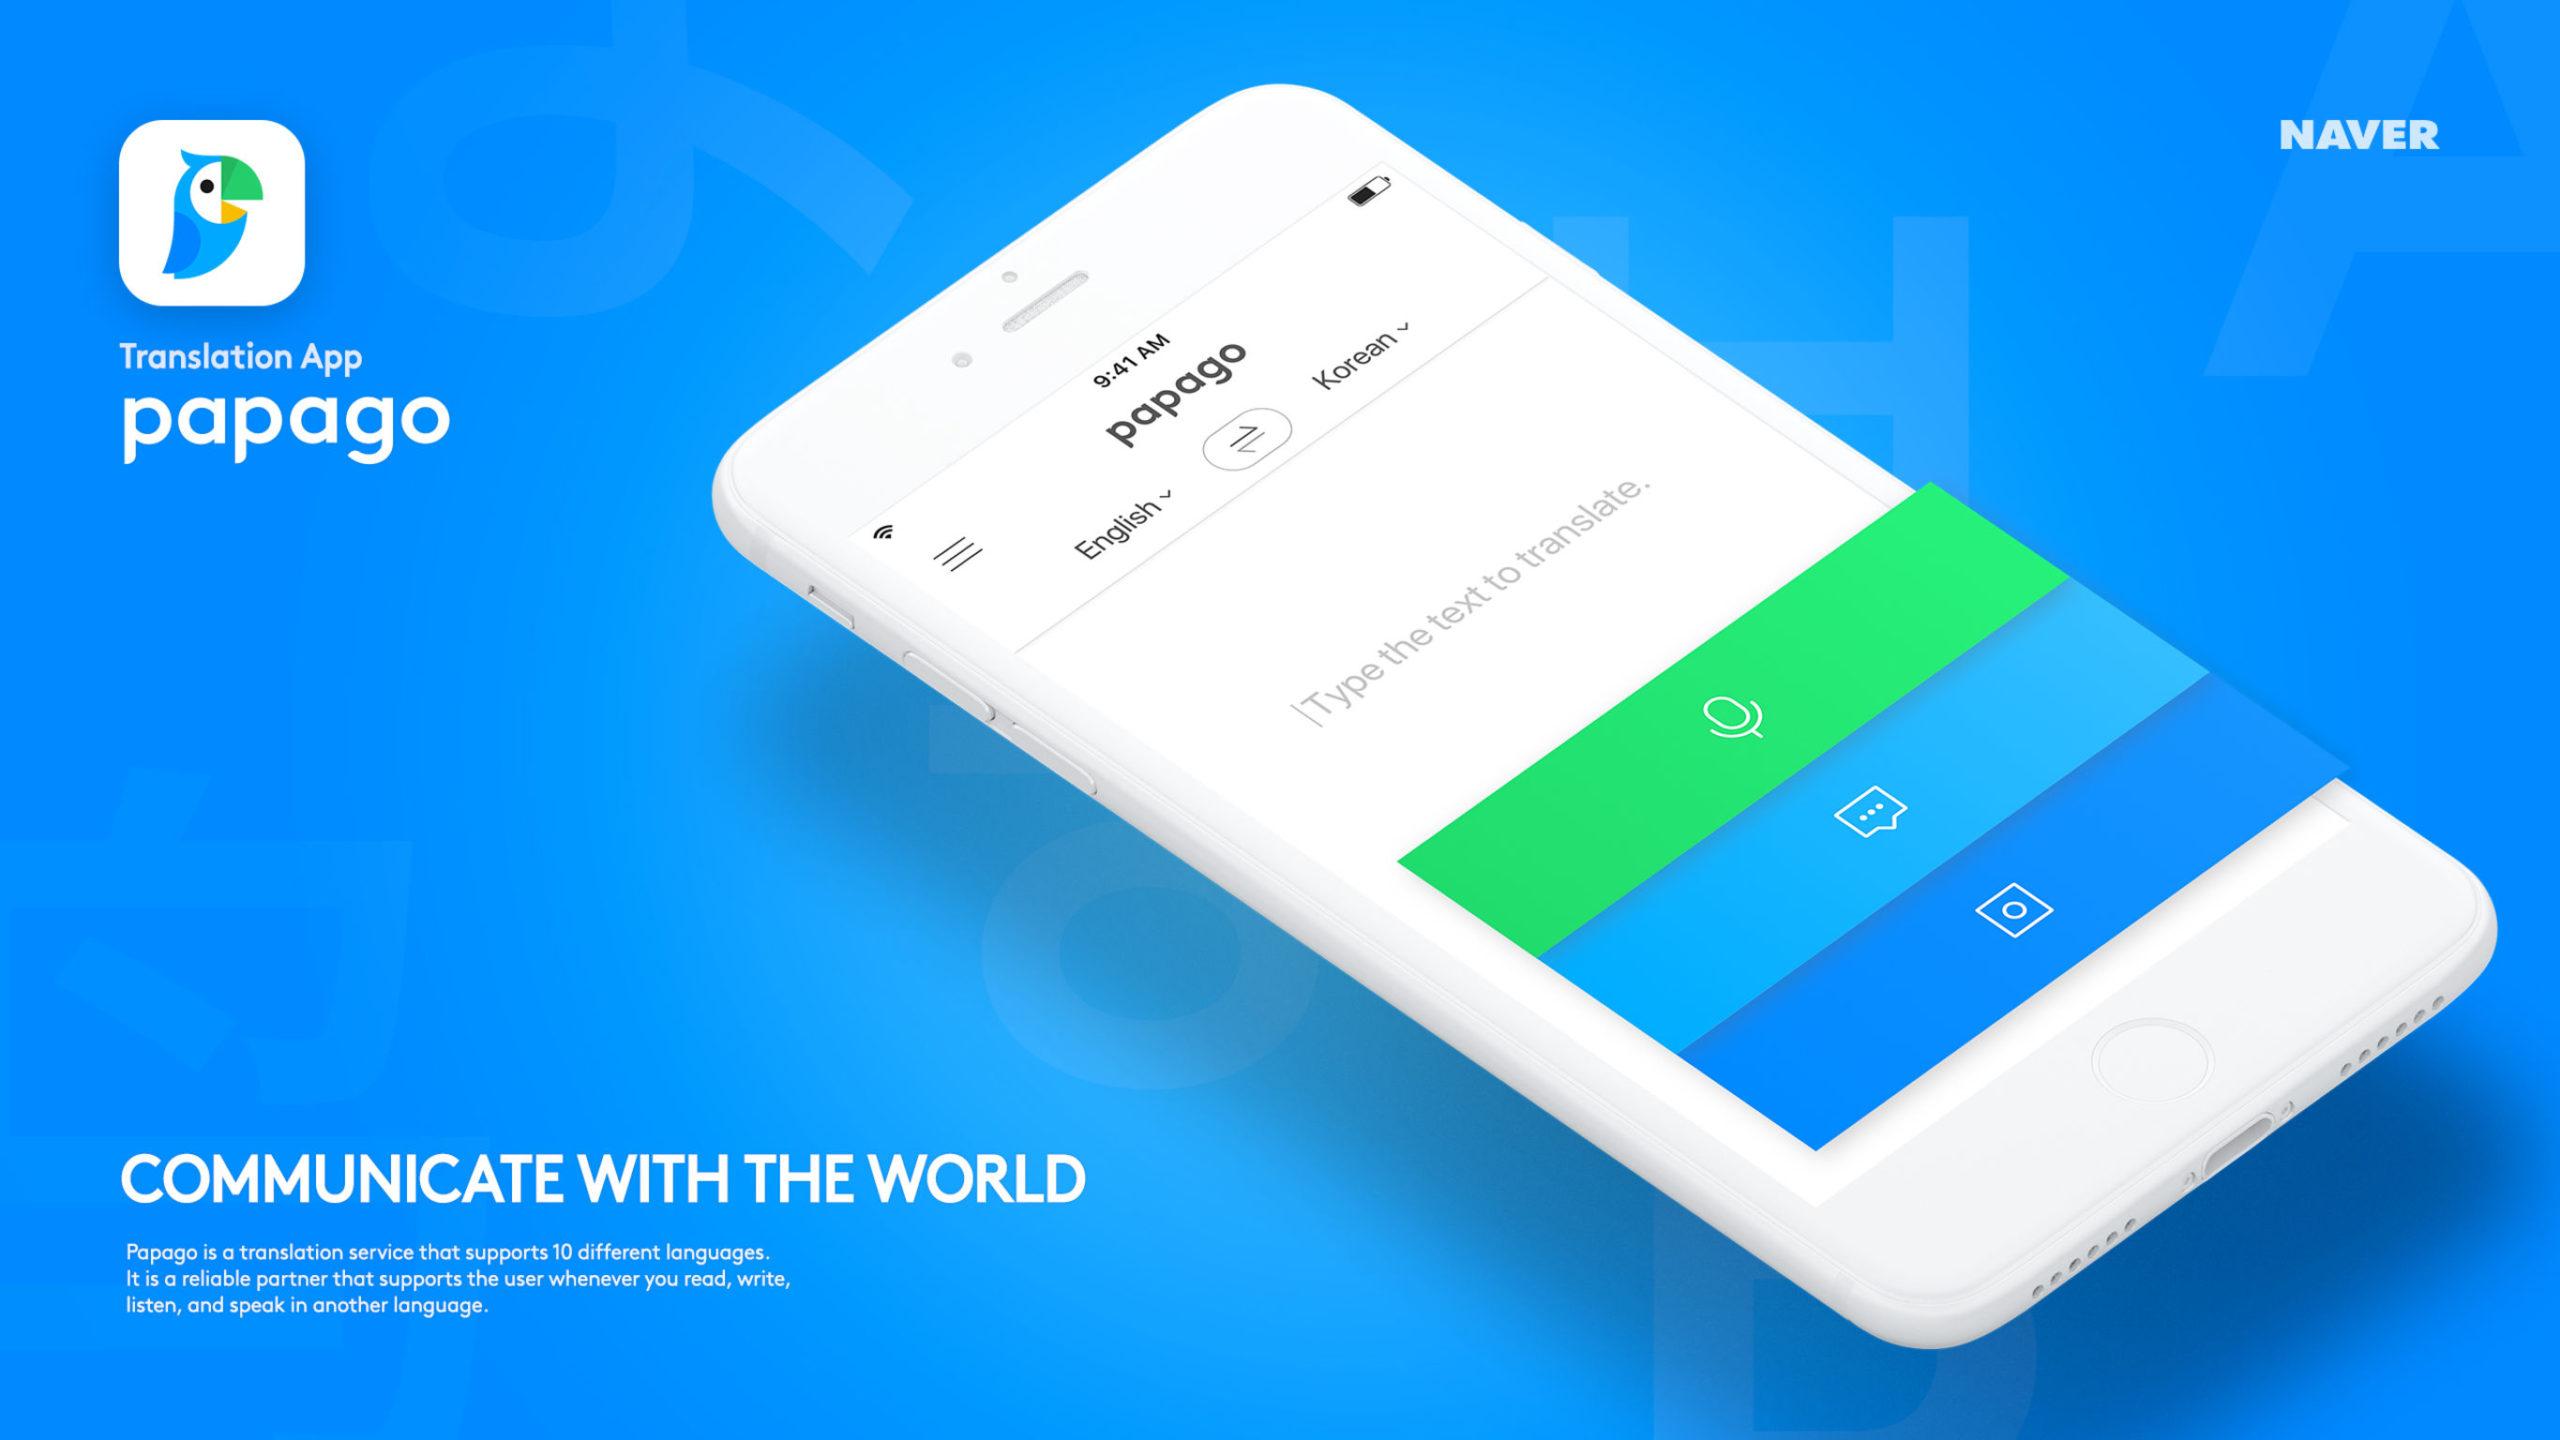 Naver Papago Translate, Translate App